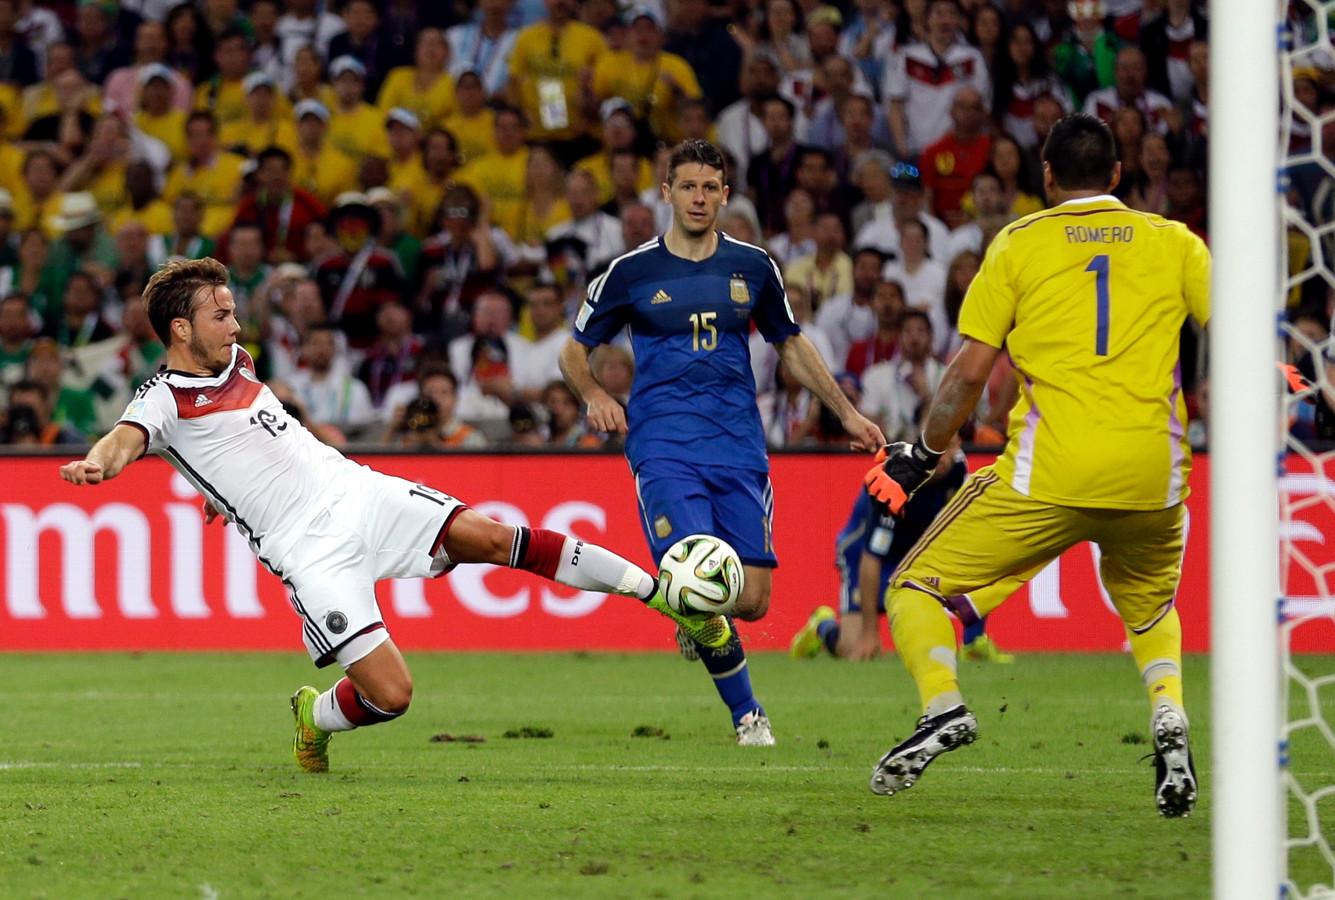 Mario Götze maakte op 13 juli 2014 de winnende goal namens Duitsland in de WK-finale tegen Argentinië.